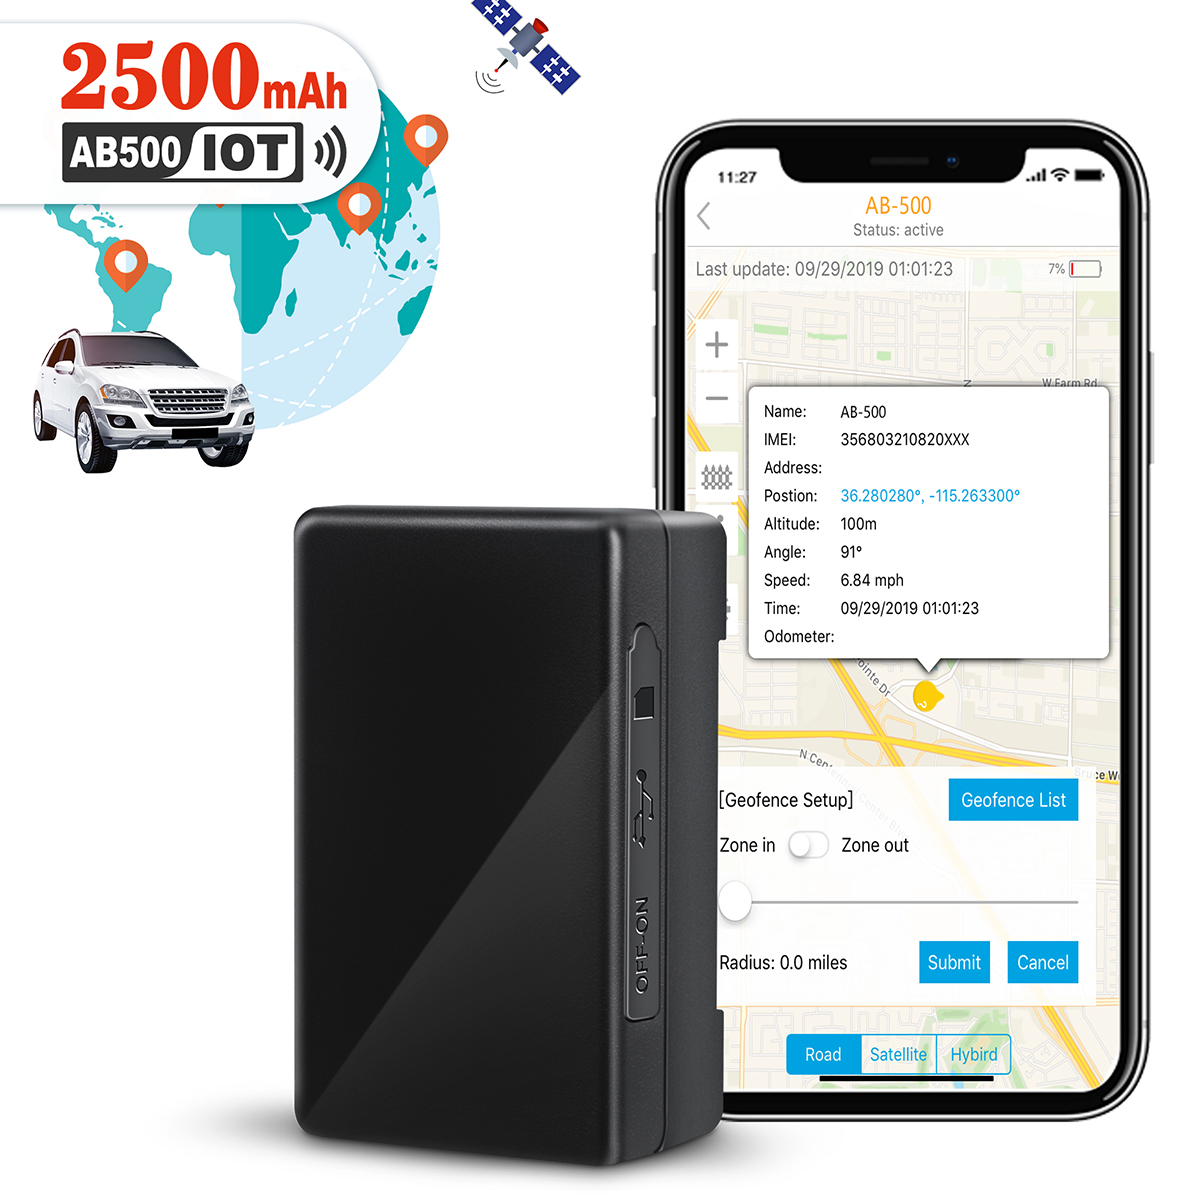 Logistimatics 4G Verizon GPS Tracker For Vehicles Cars GPS Tracker w No Contract